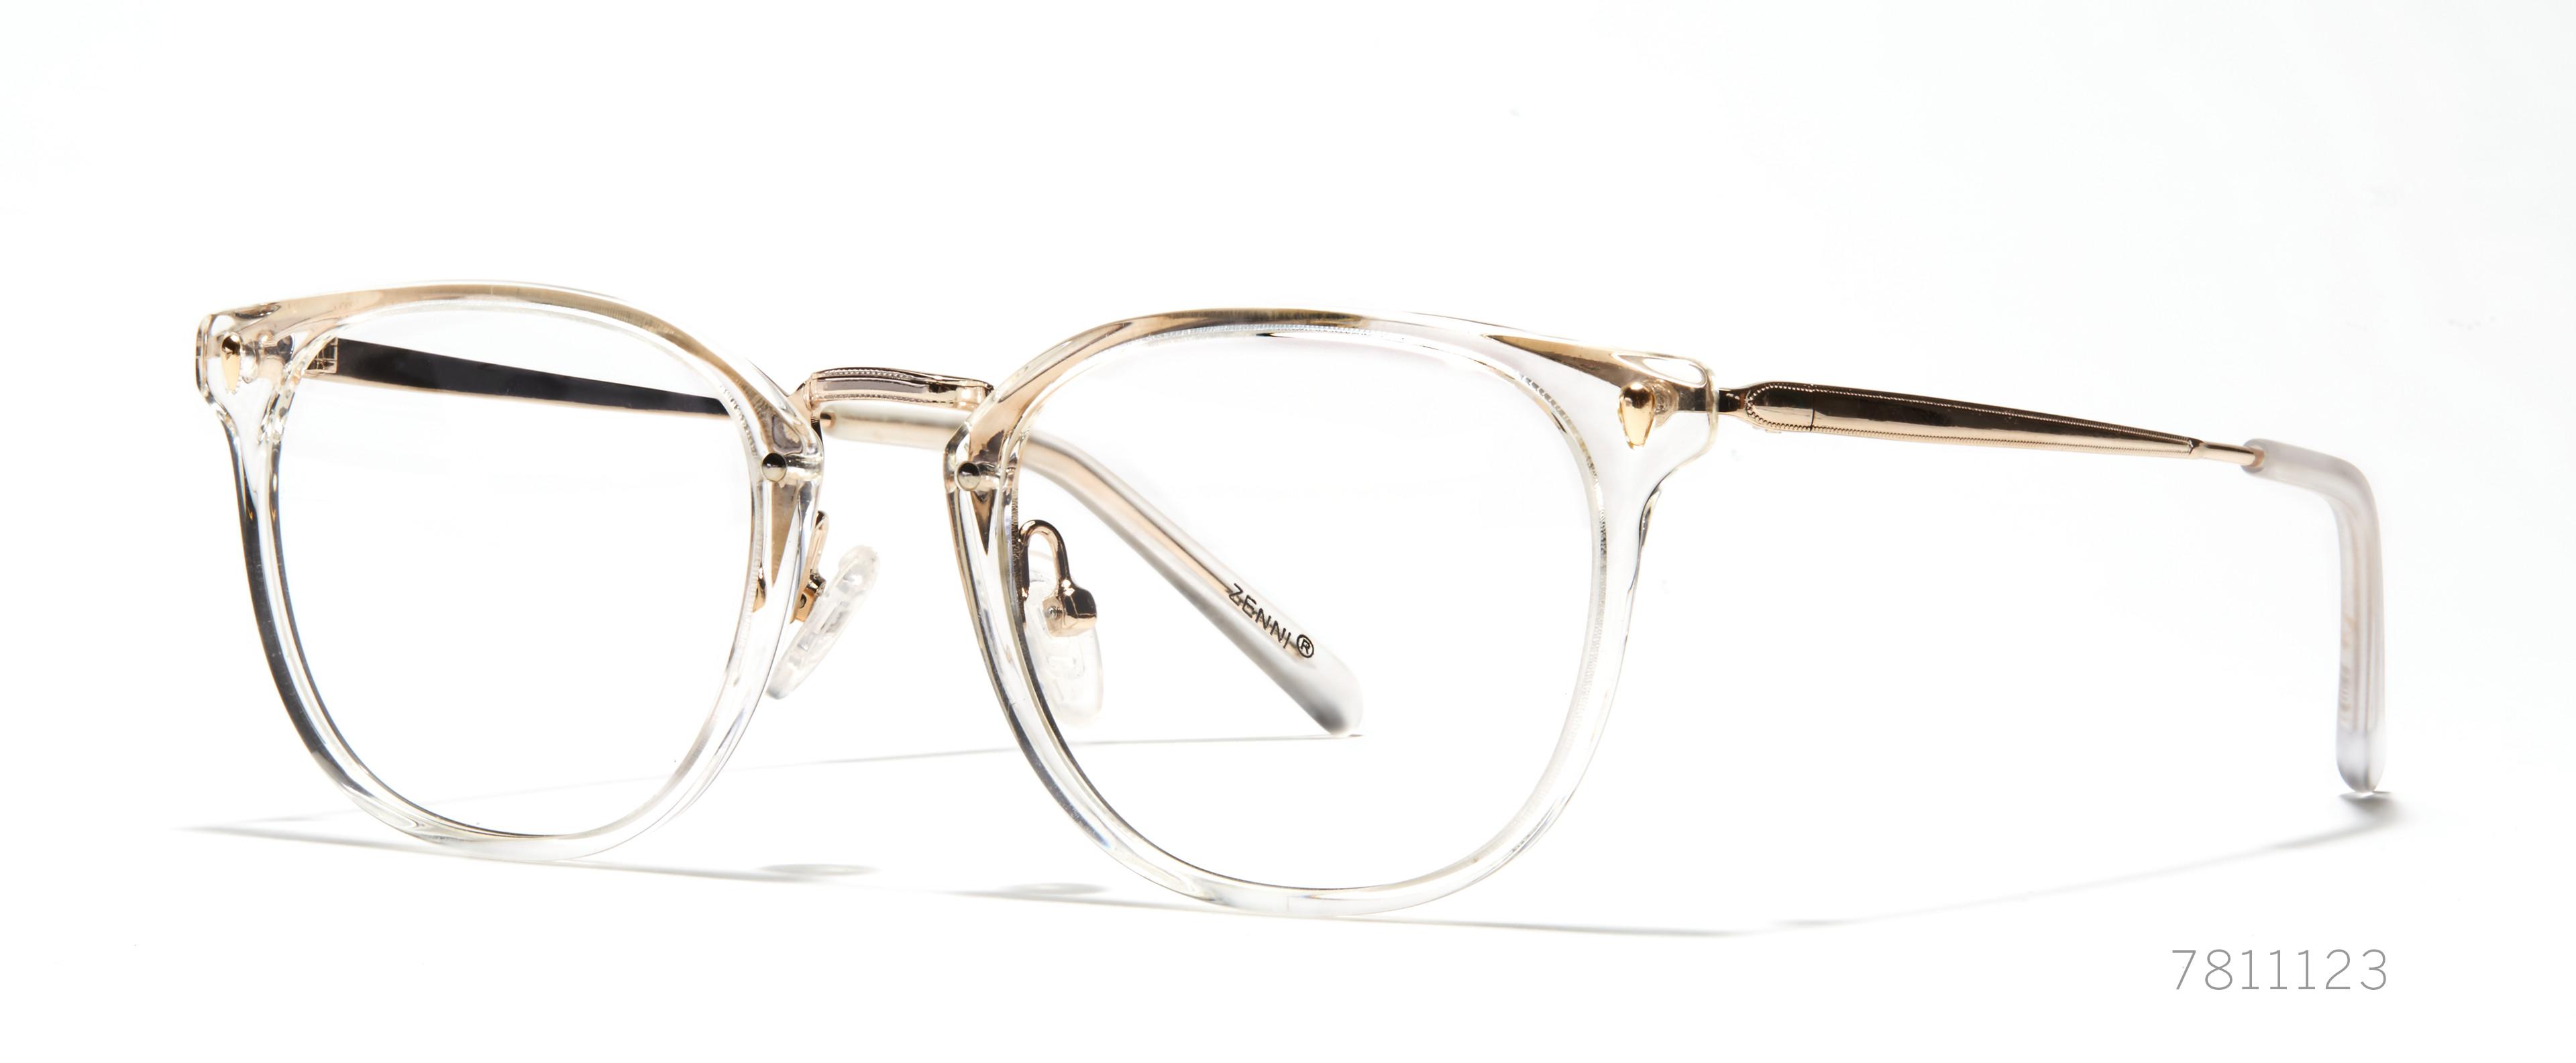 eye glasses round faces